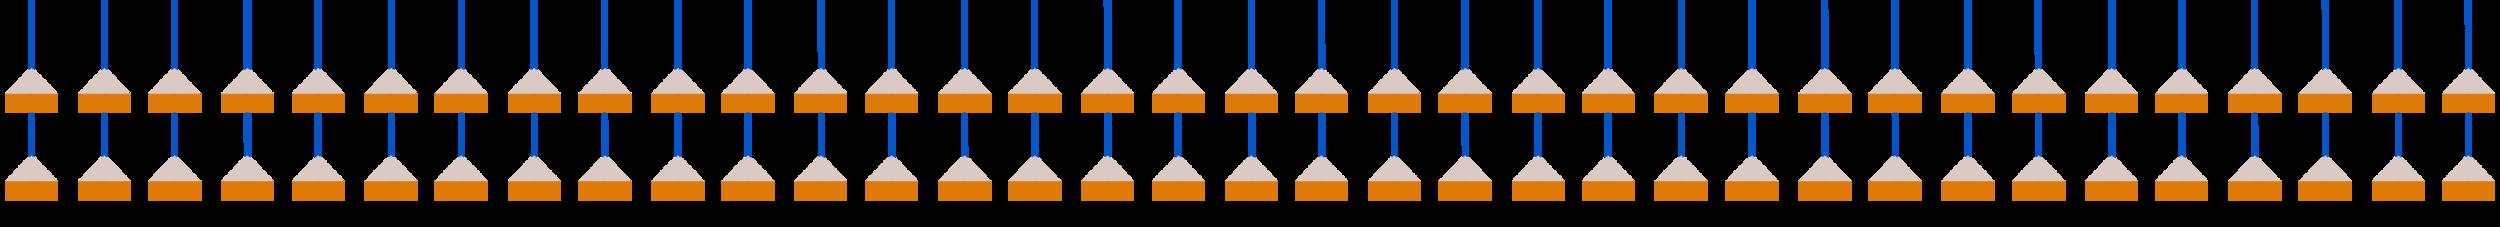 A geometric pattern of buoys.